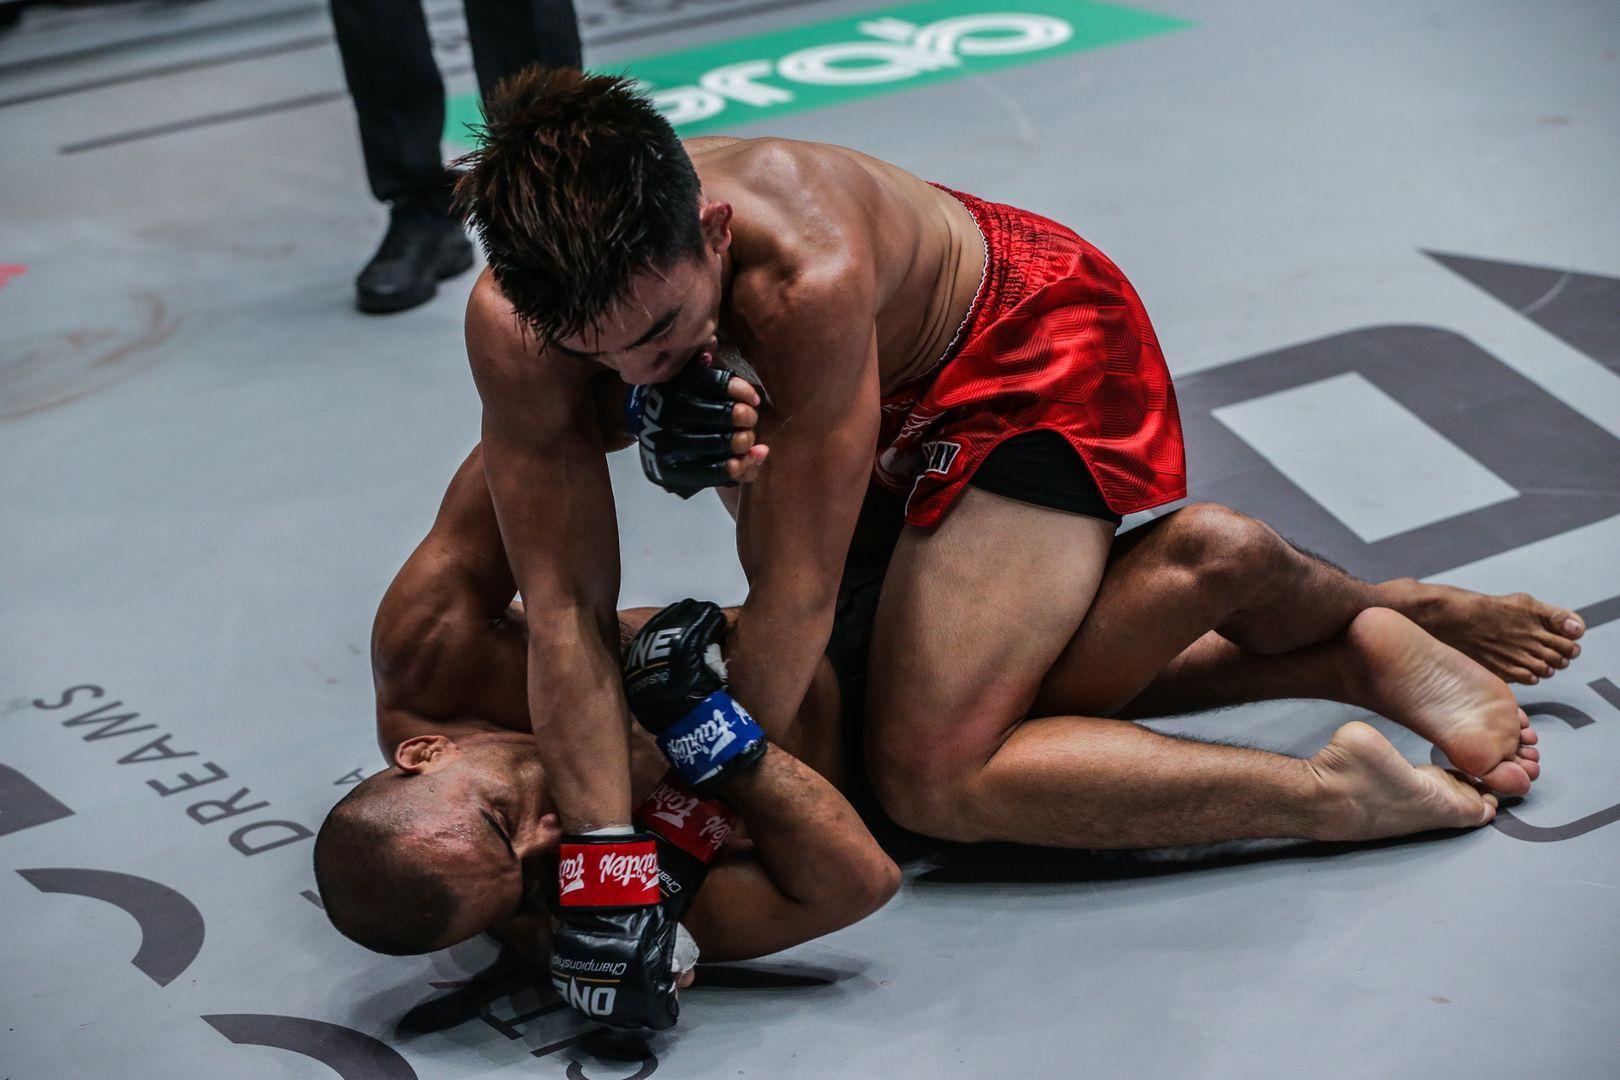 Filipino MMA fighter Joshua Pacio unleashes ground-and-pound on Rene Catalan